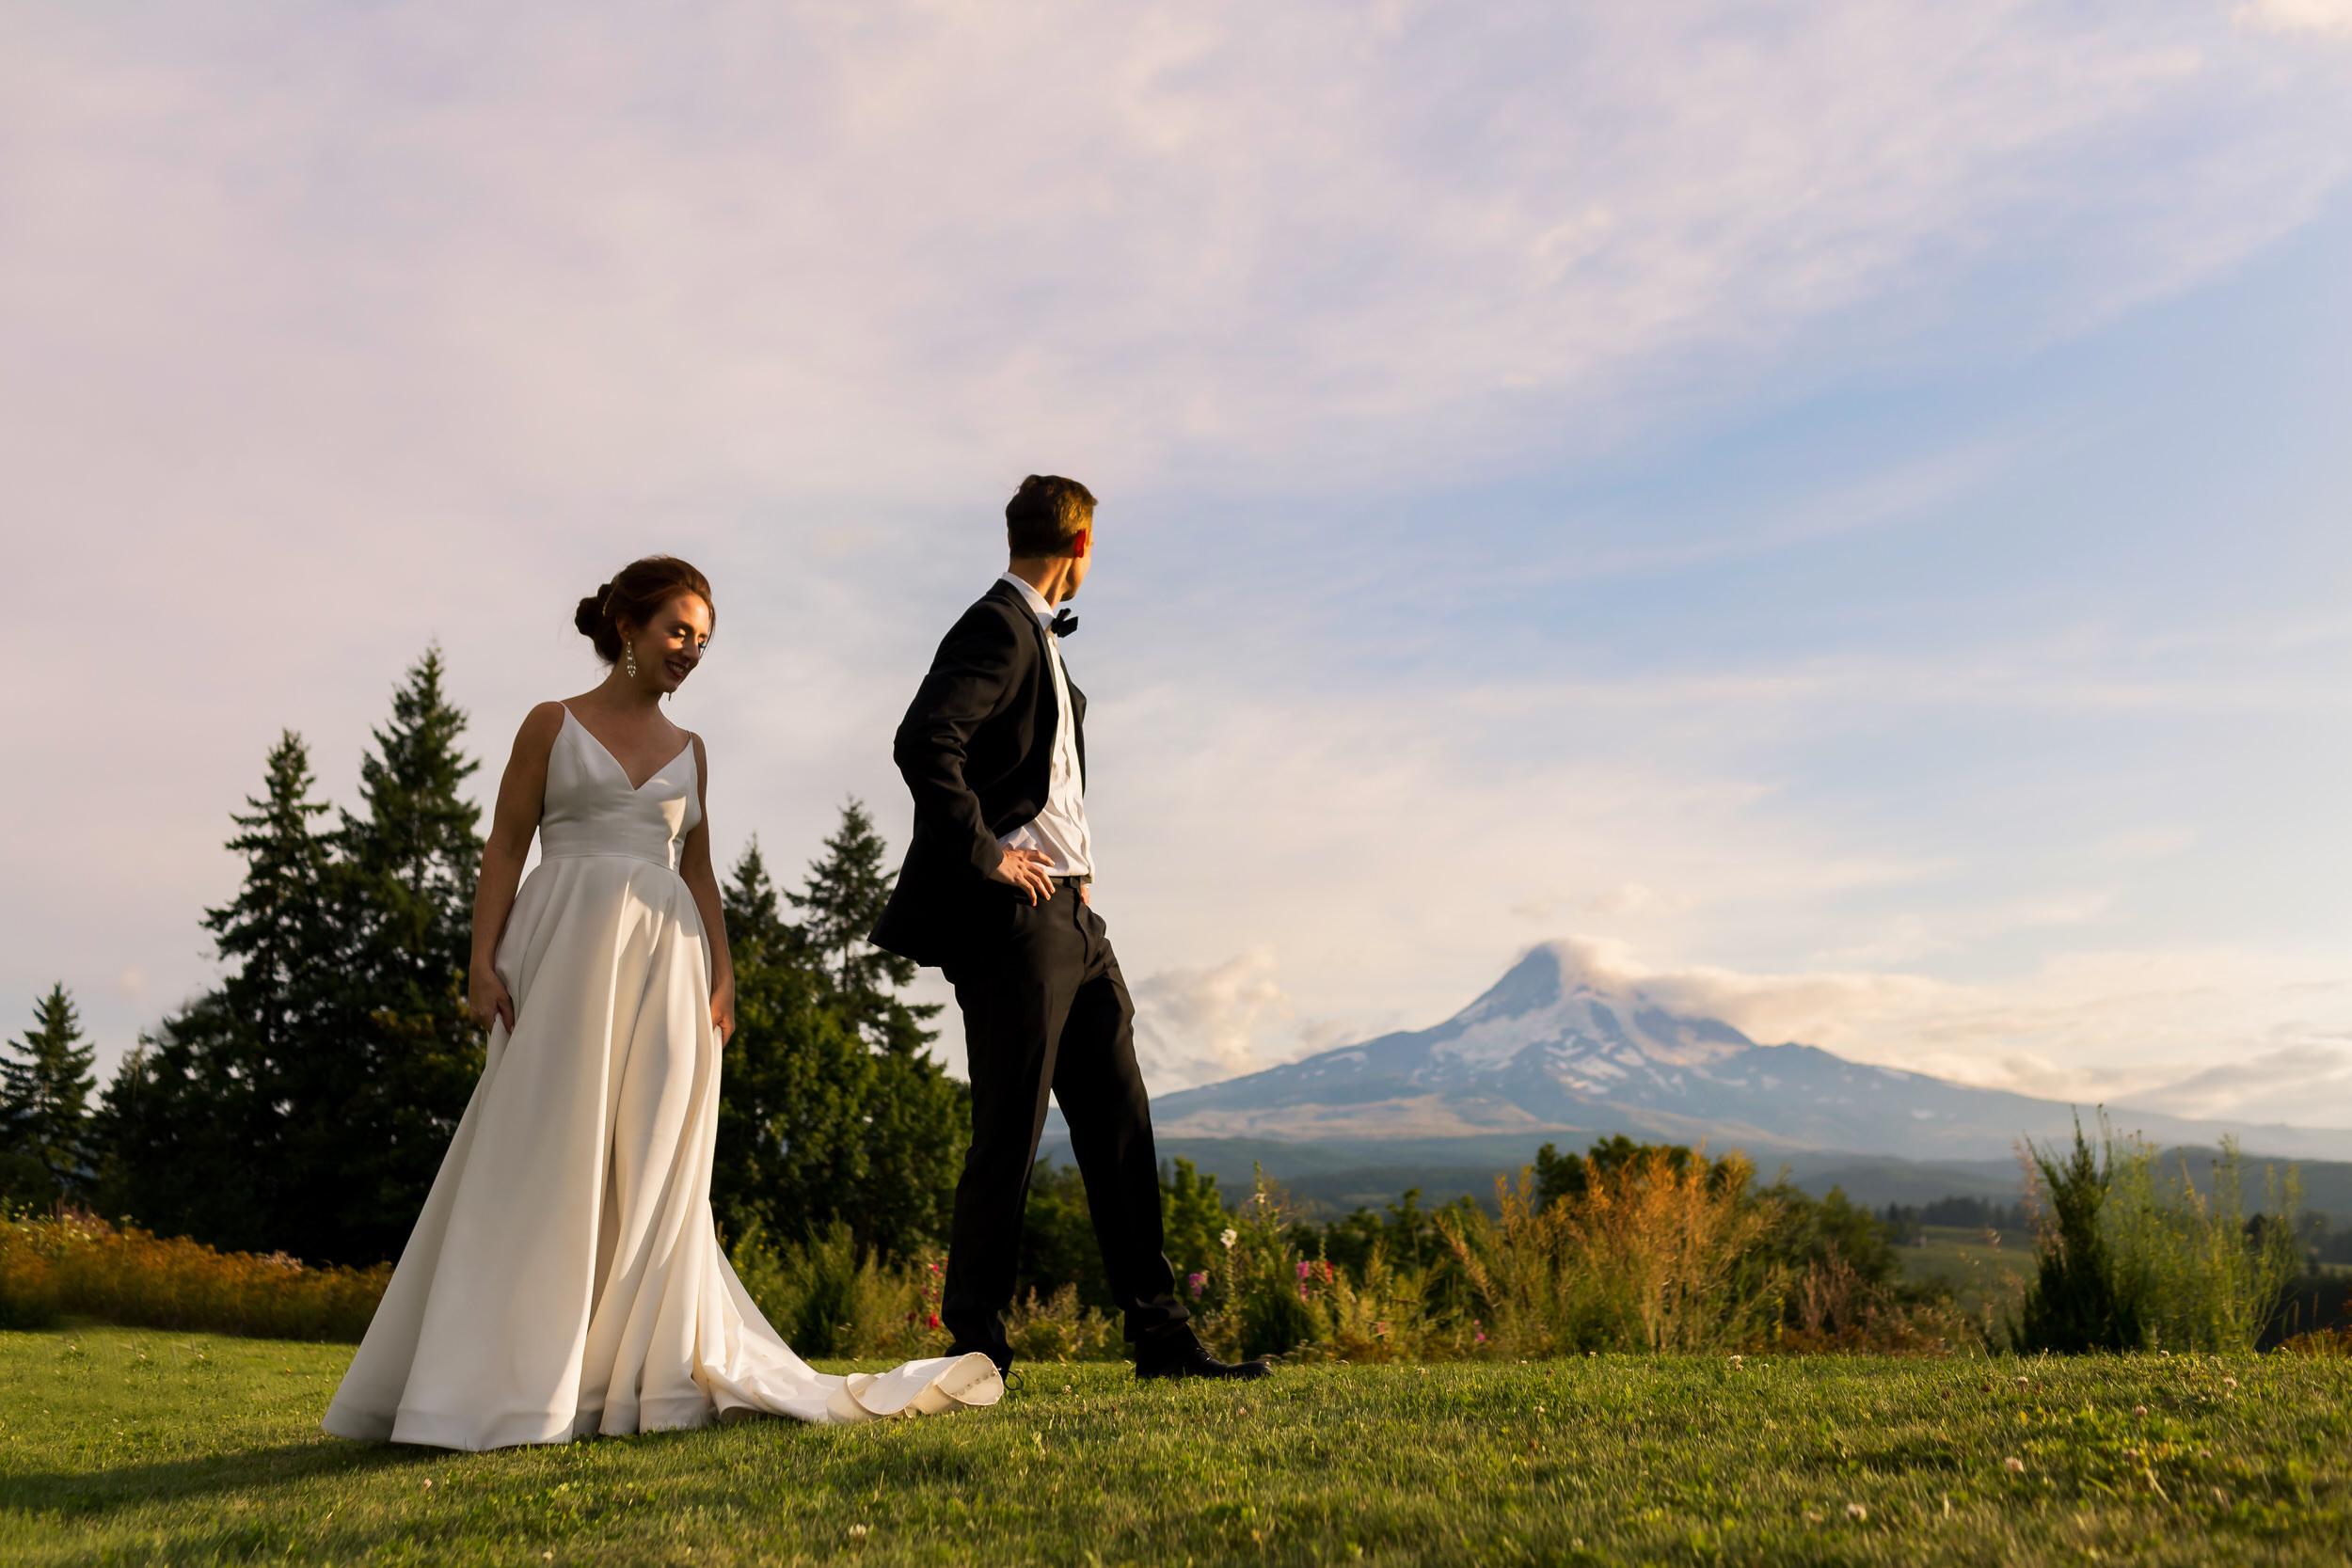 mthoodorganicfarms_wedding_BK059_starkphotography